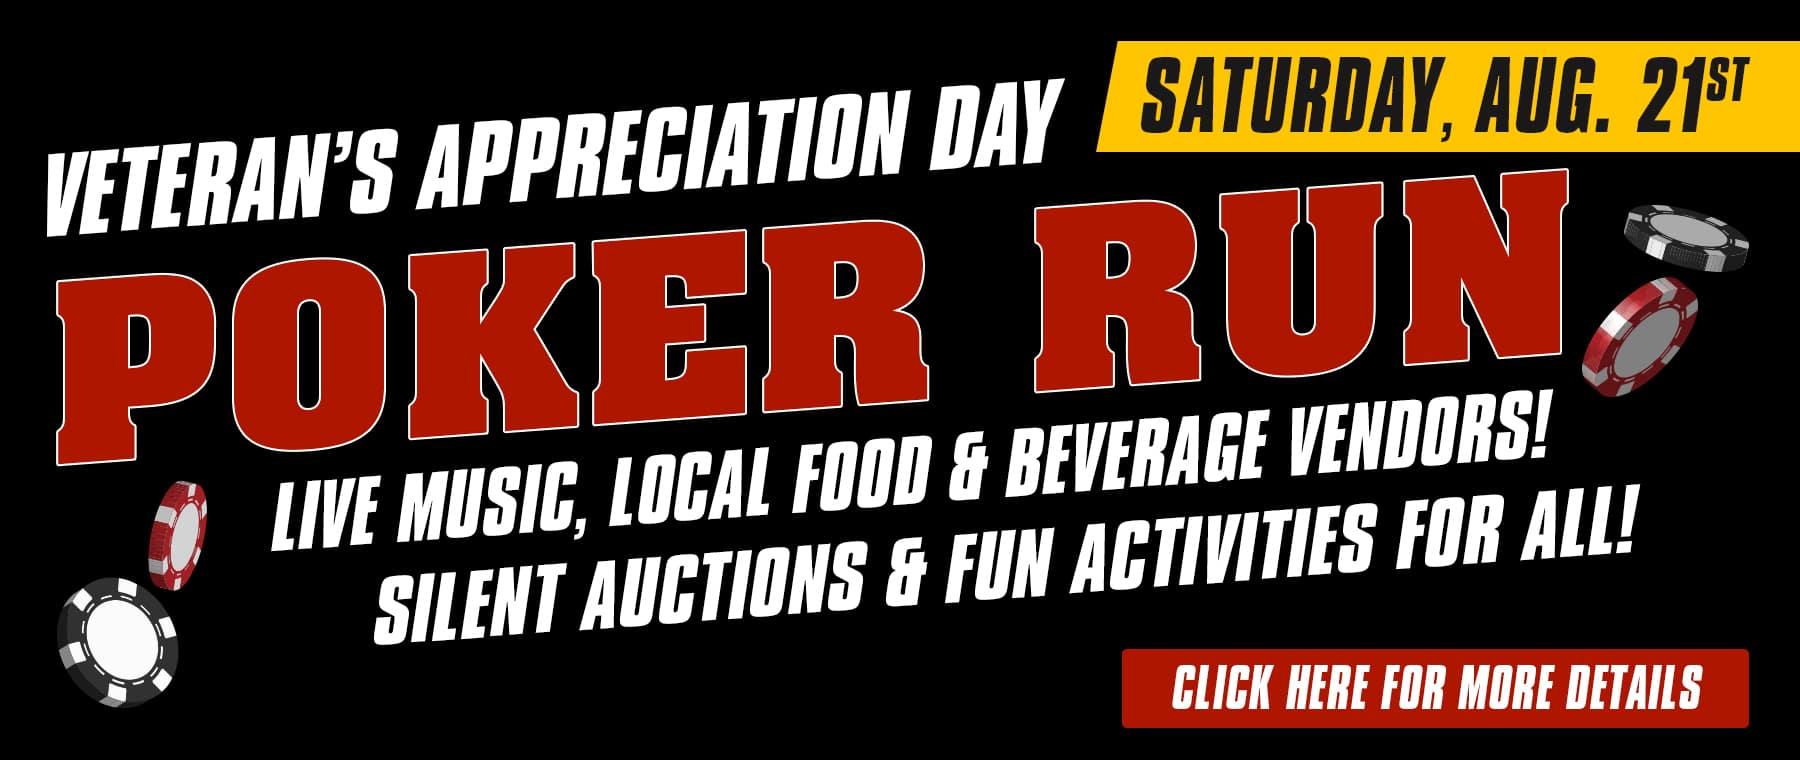 Veteran Appreciation Day - Poker Run, Saturday Aug. 21st